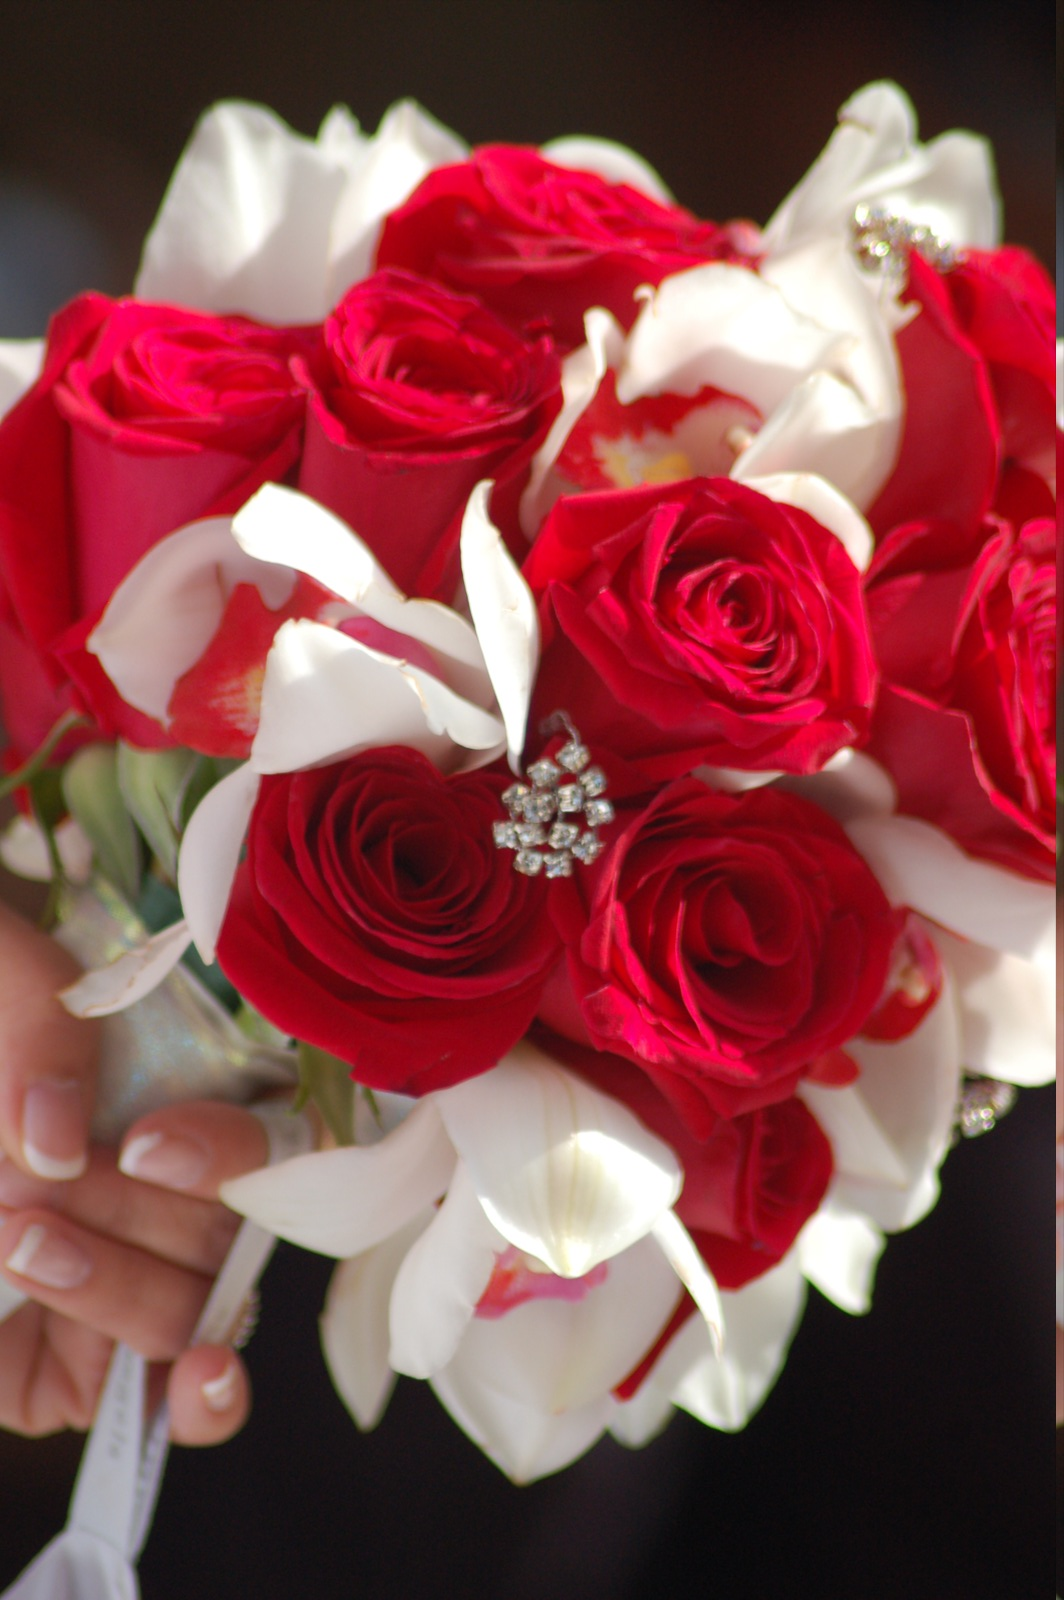 Wedding Flowers Roses Wedding Flower Design Wedding Flower Bouquets White Wedding Flower